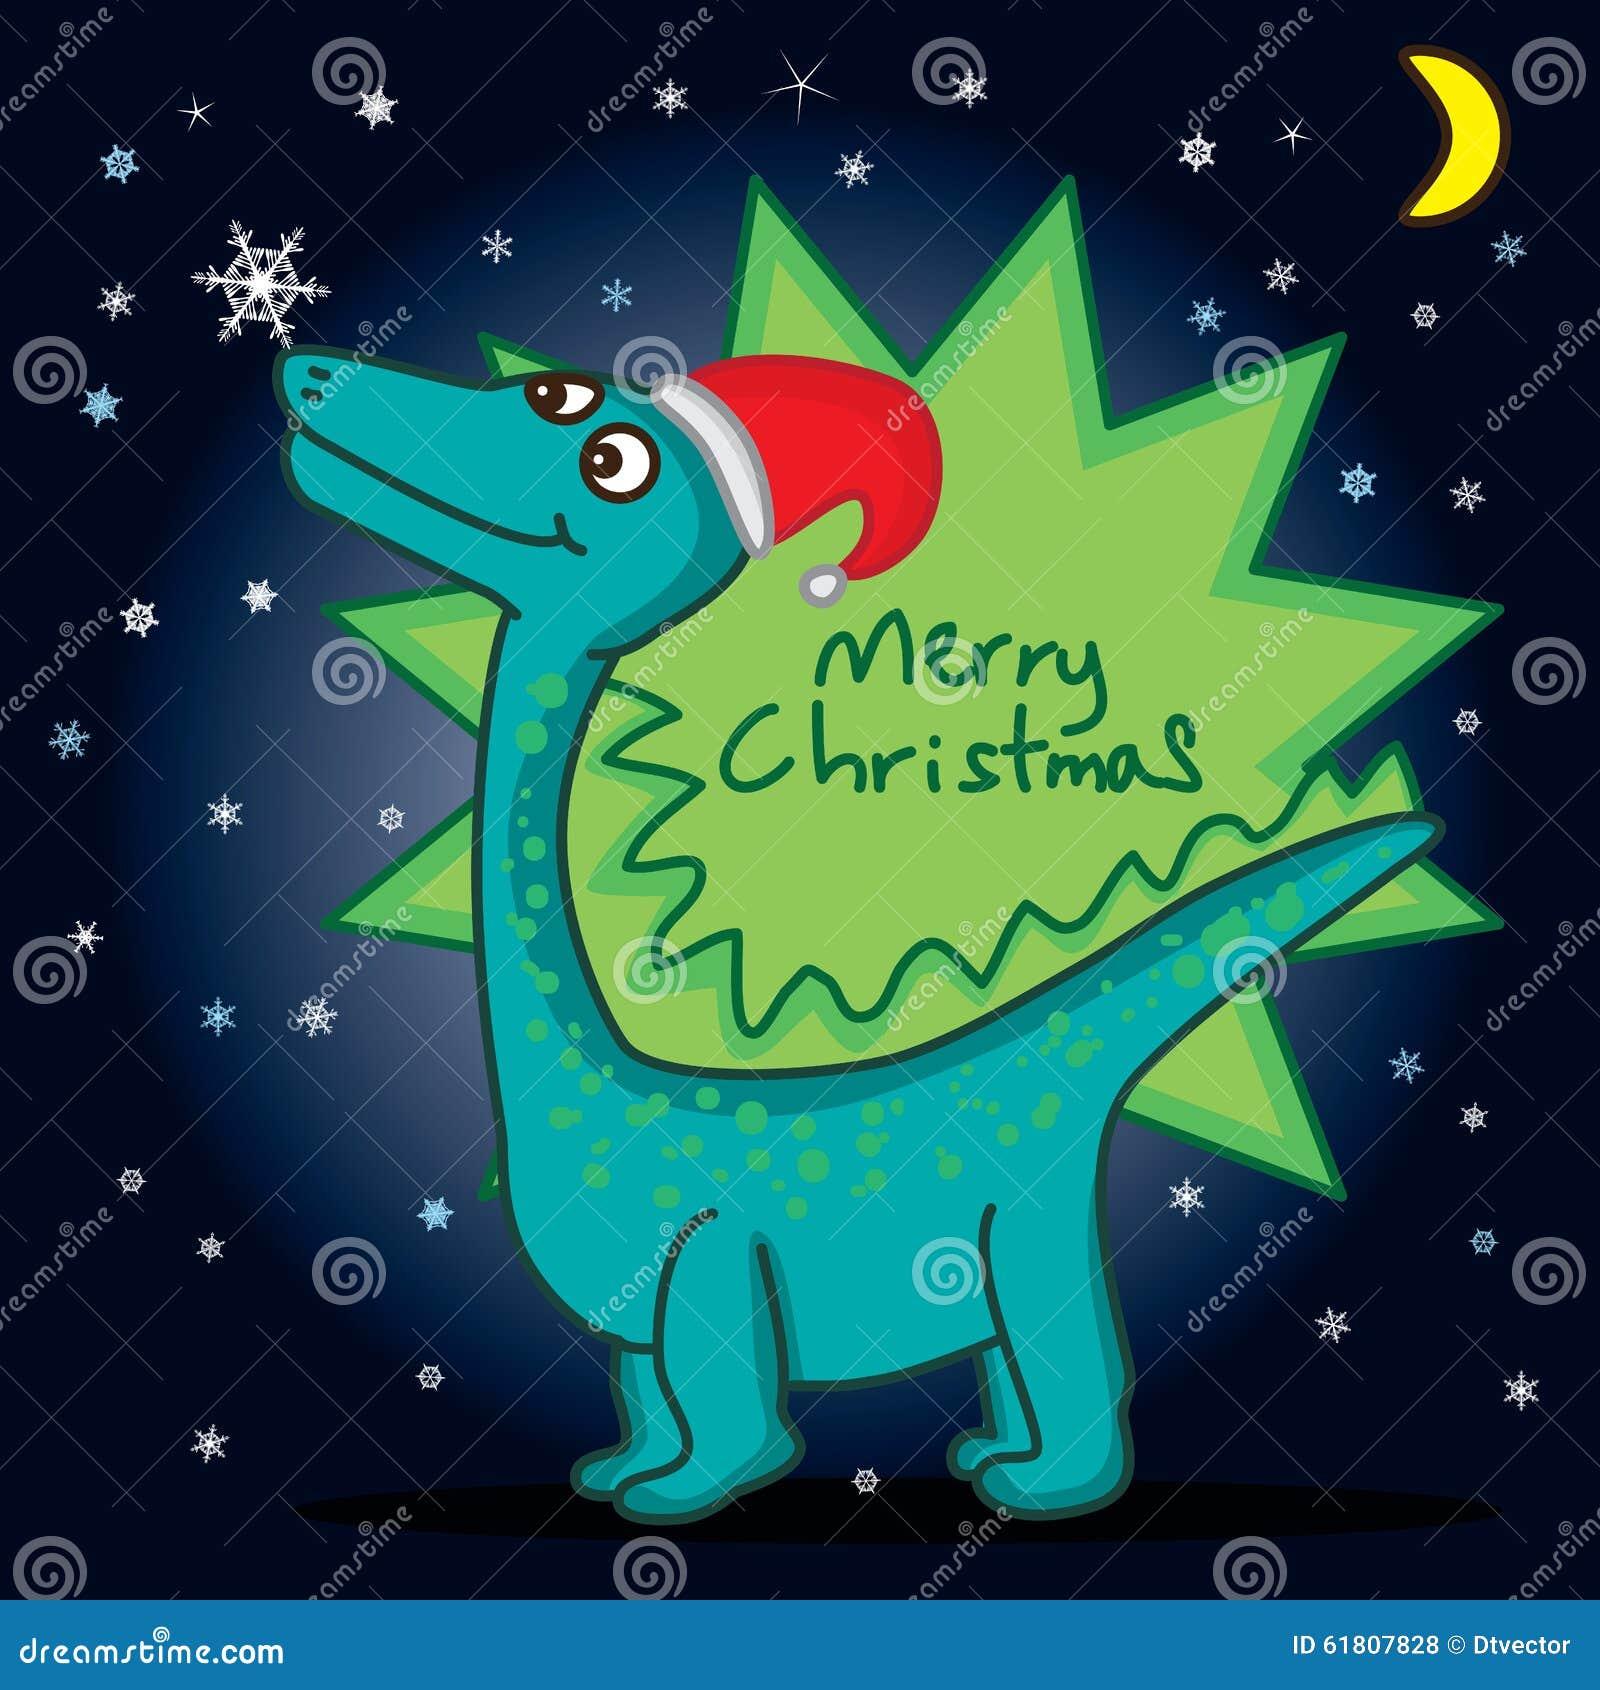 Dino Hello Snowflake Stock Vector - Image: 61807828